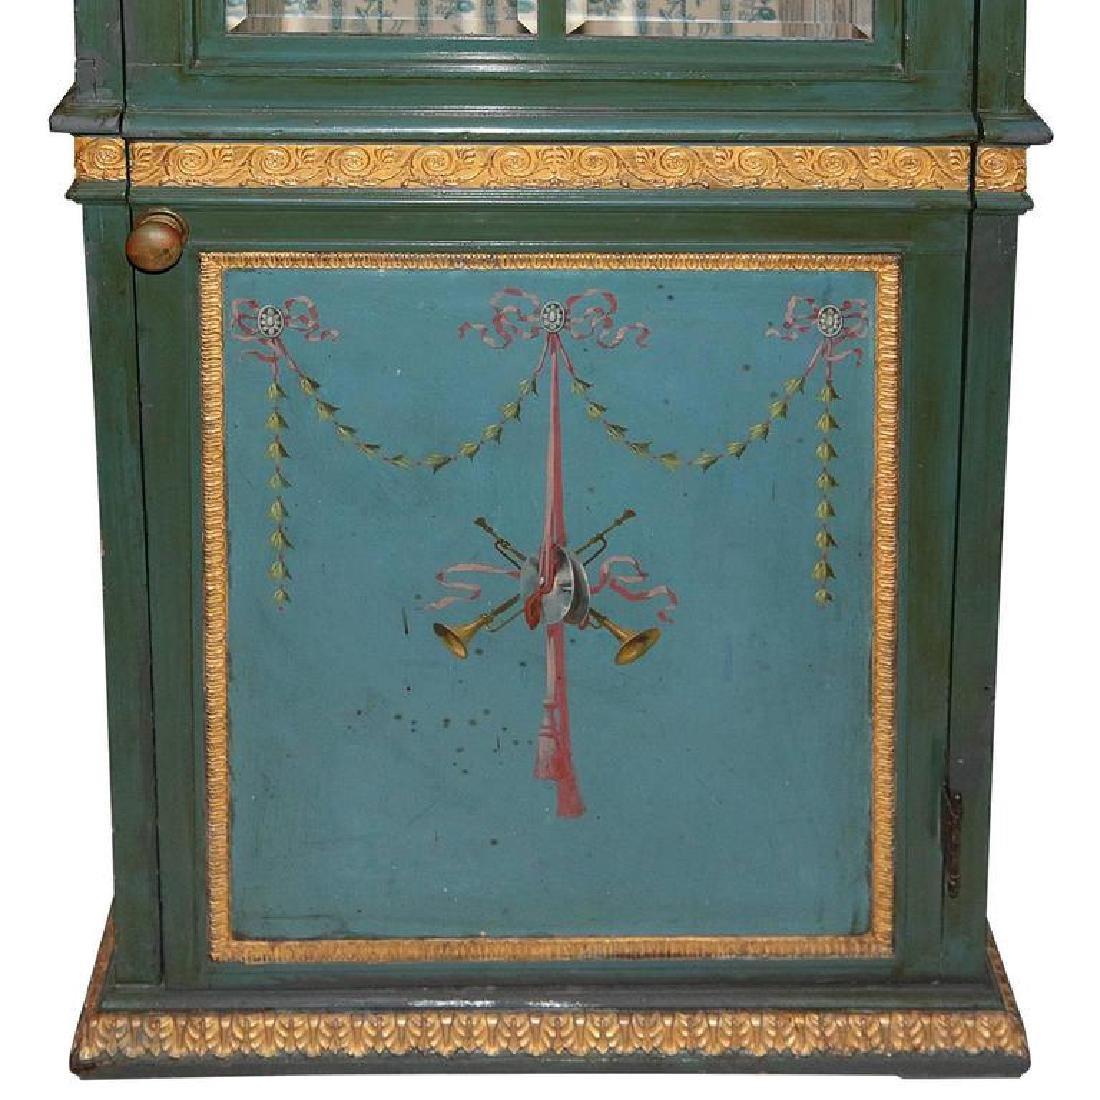 19th Century Venetian Giltwood Hand-Painted Sedan Chair - 6